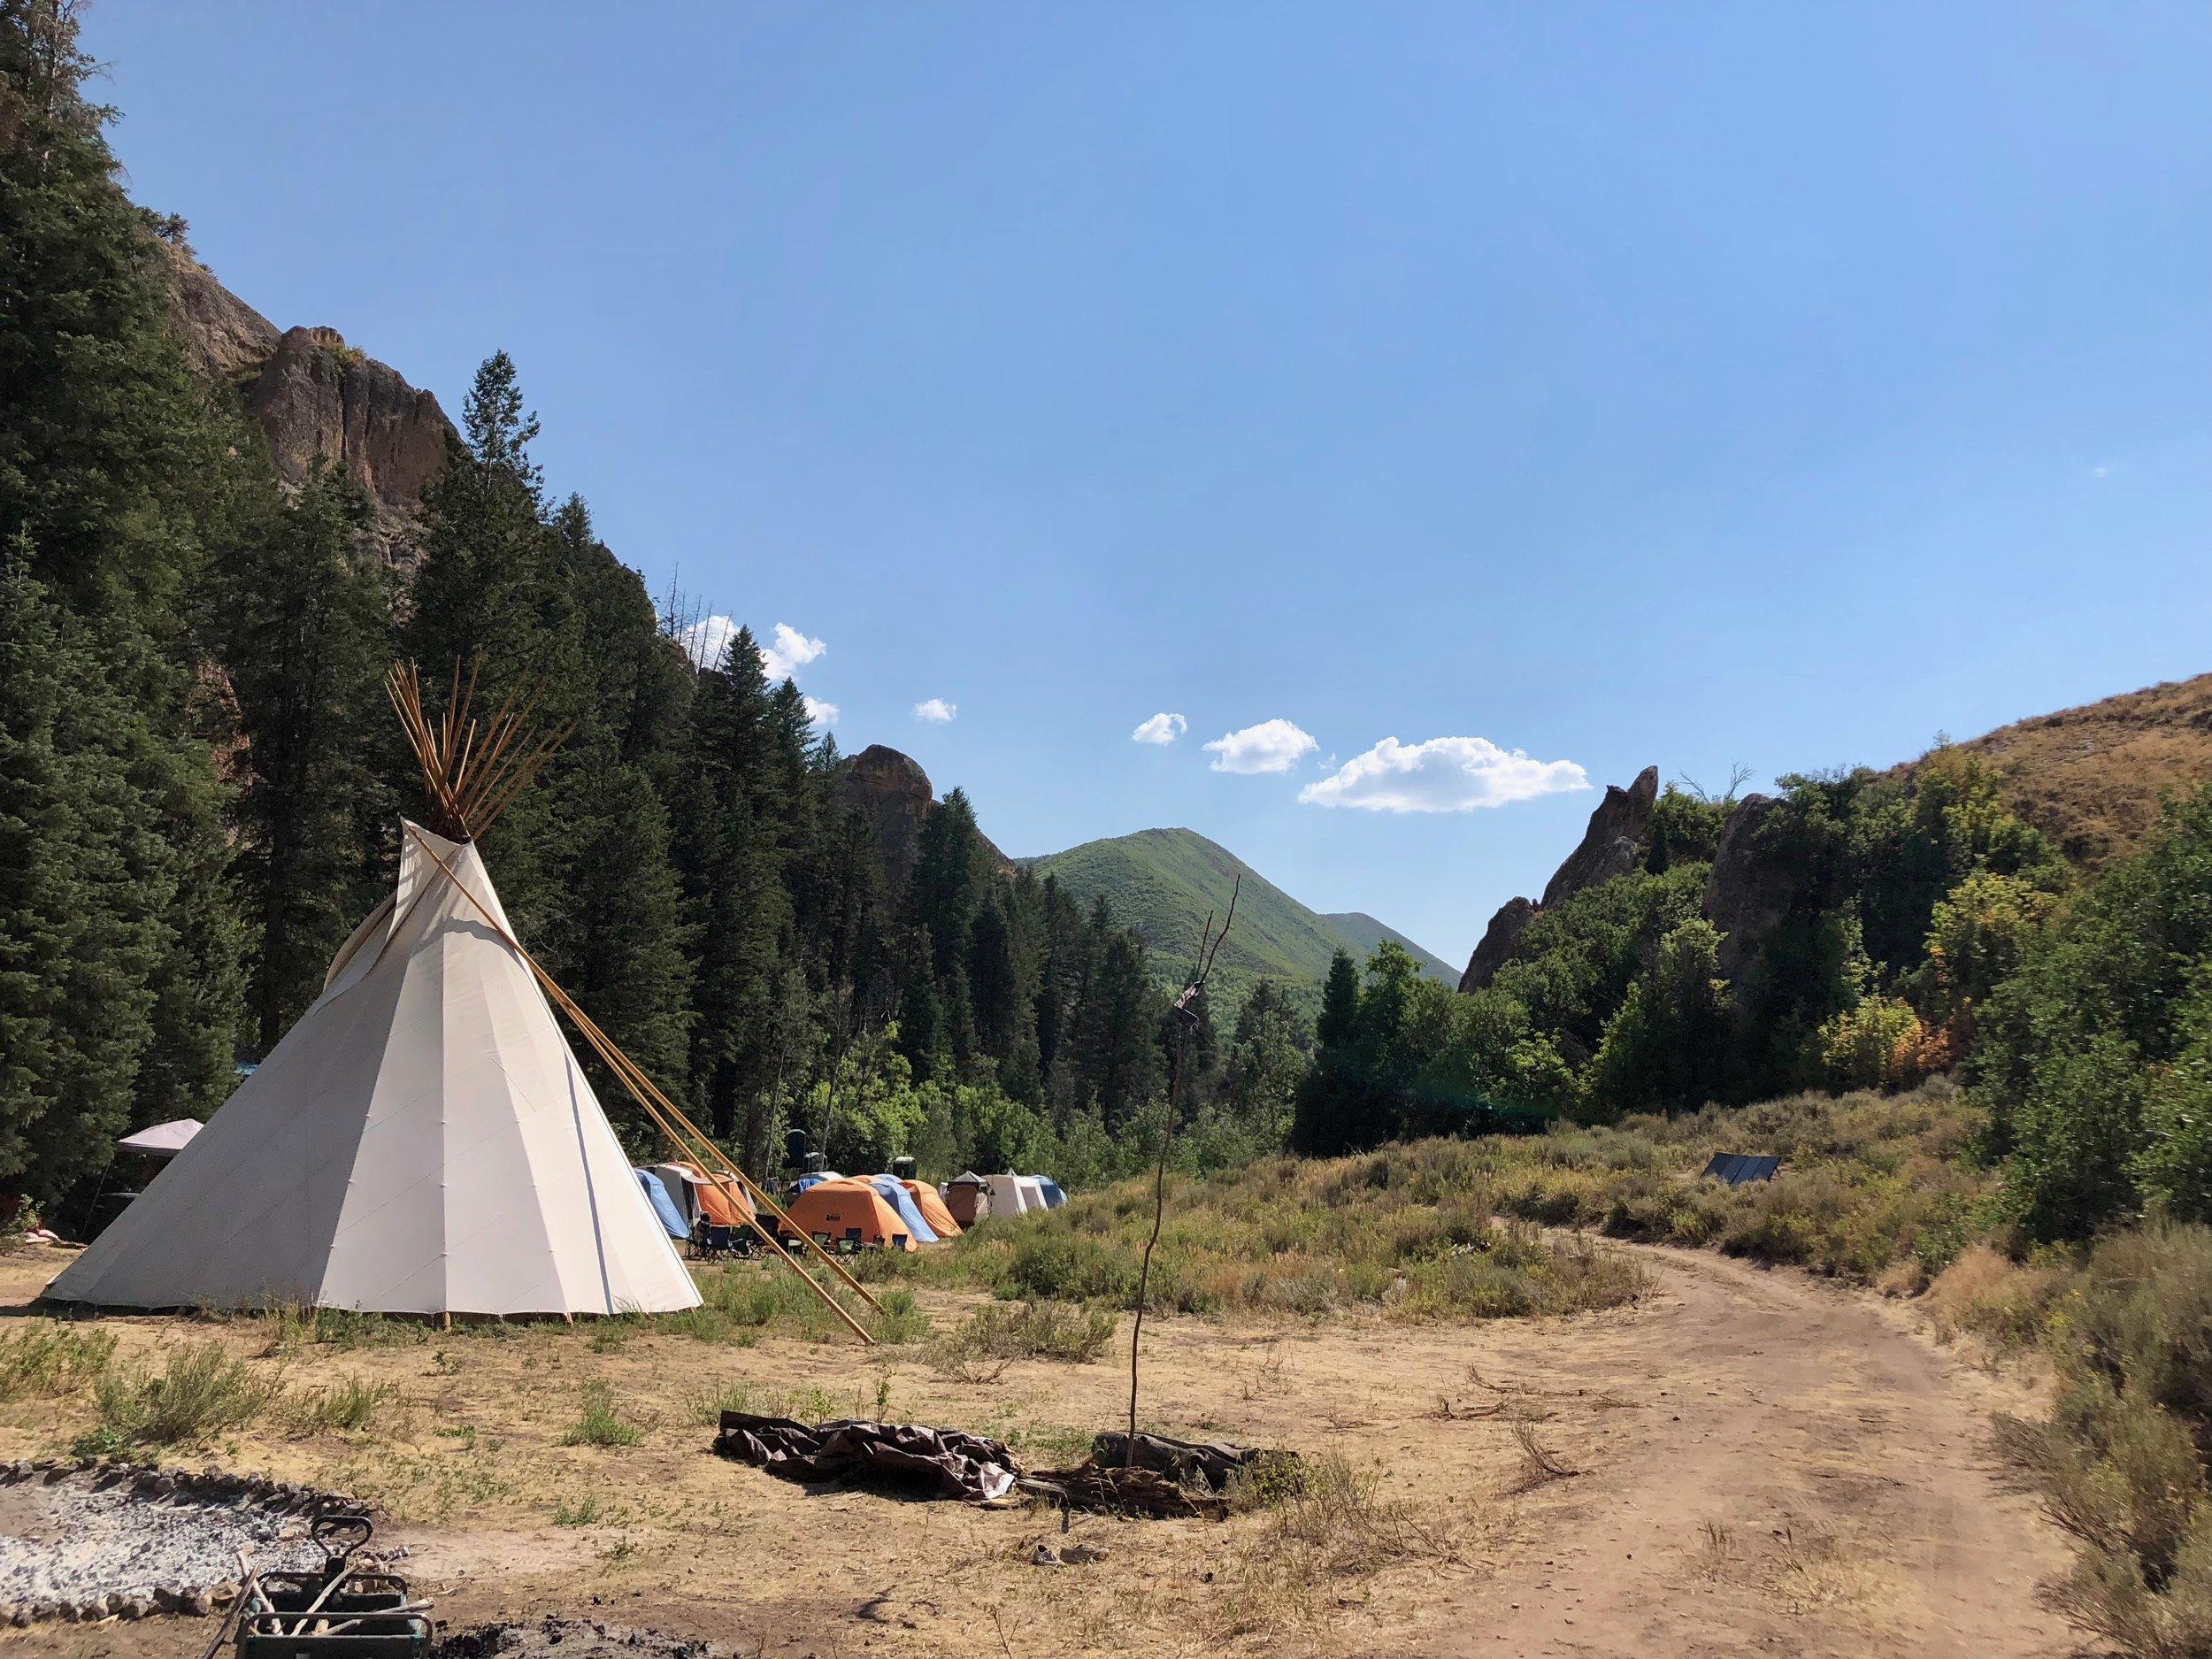 heather-molina-onac-camp